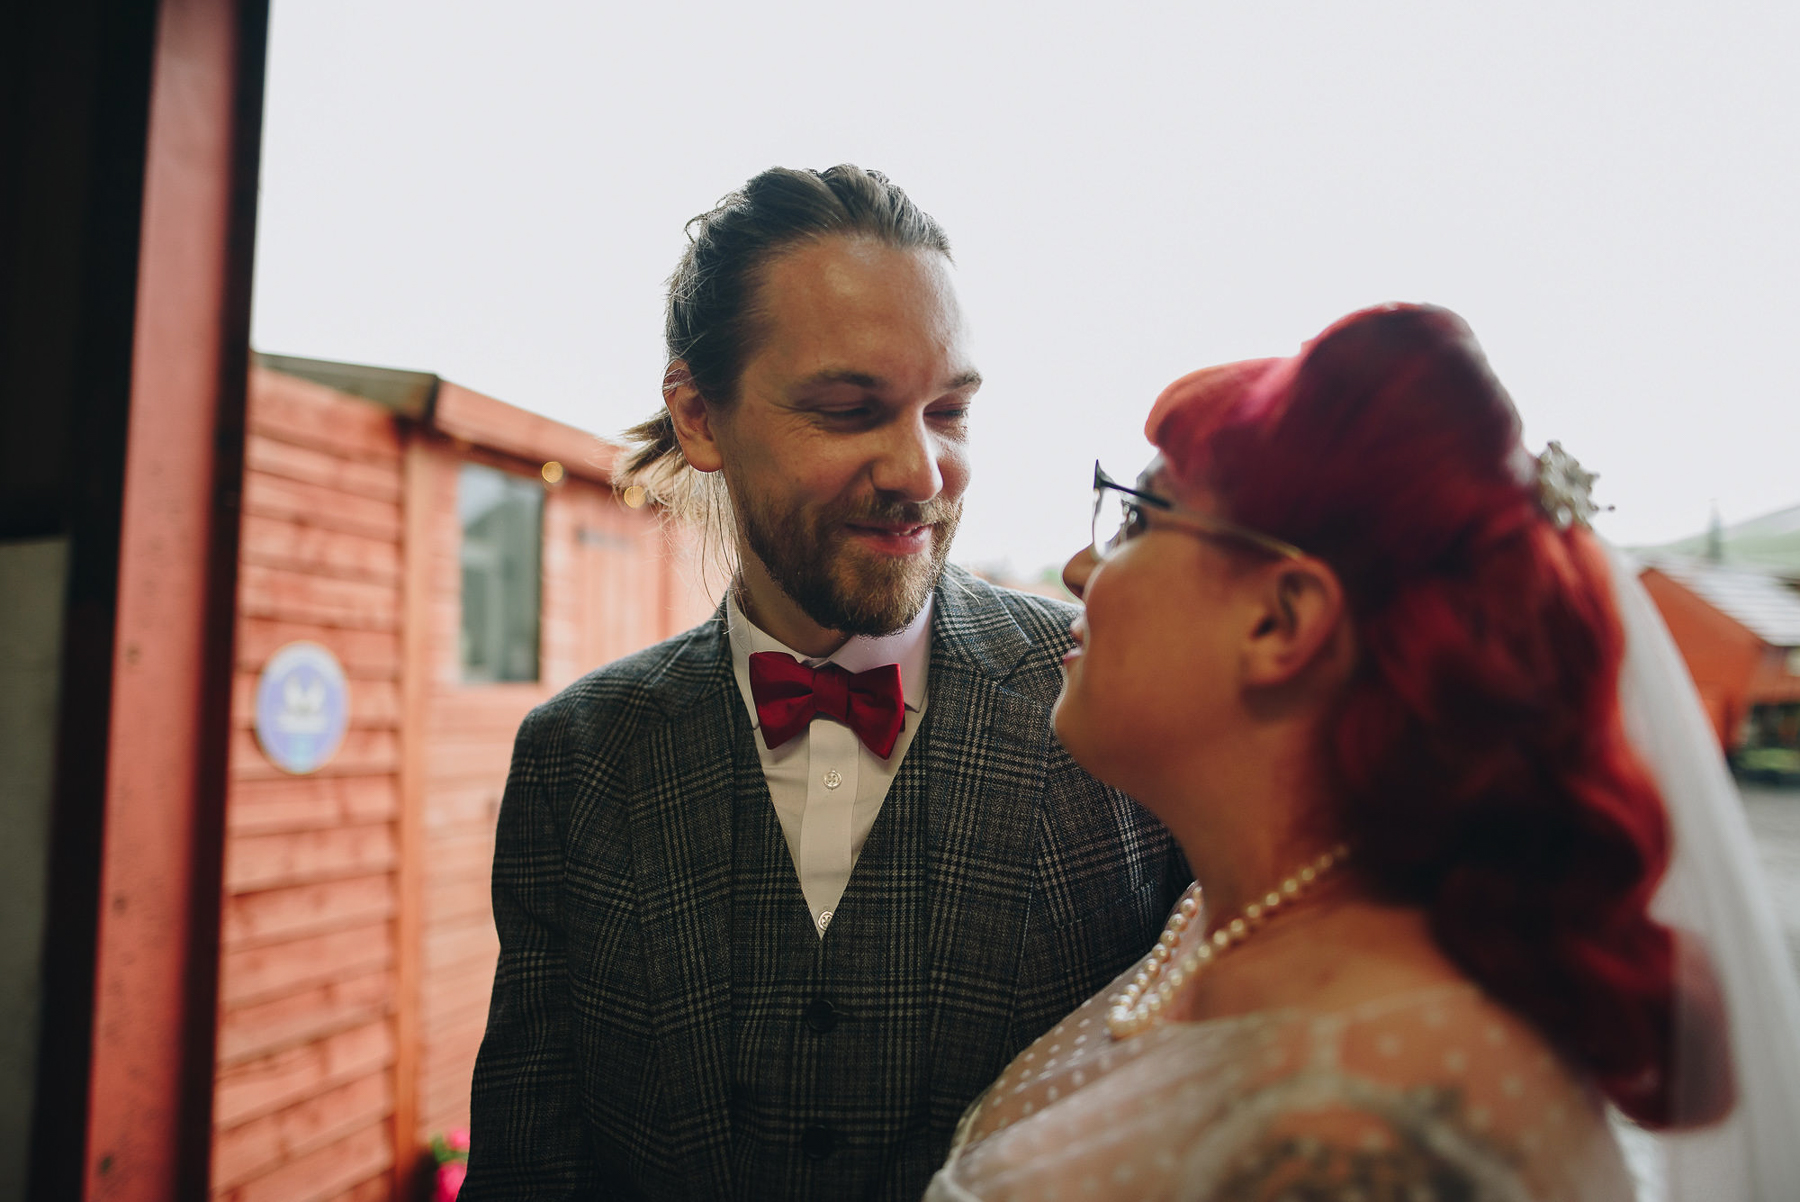 Wellbeing_Farm_Wedding_Photography_The_Pin-Up_Bride_Lara_Shaun-85.jpg